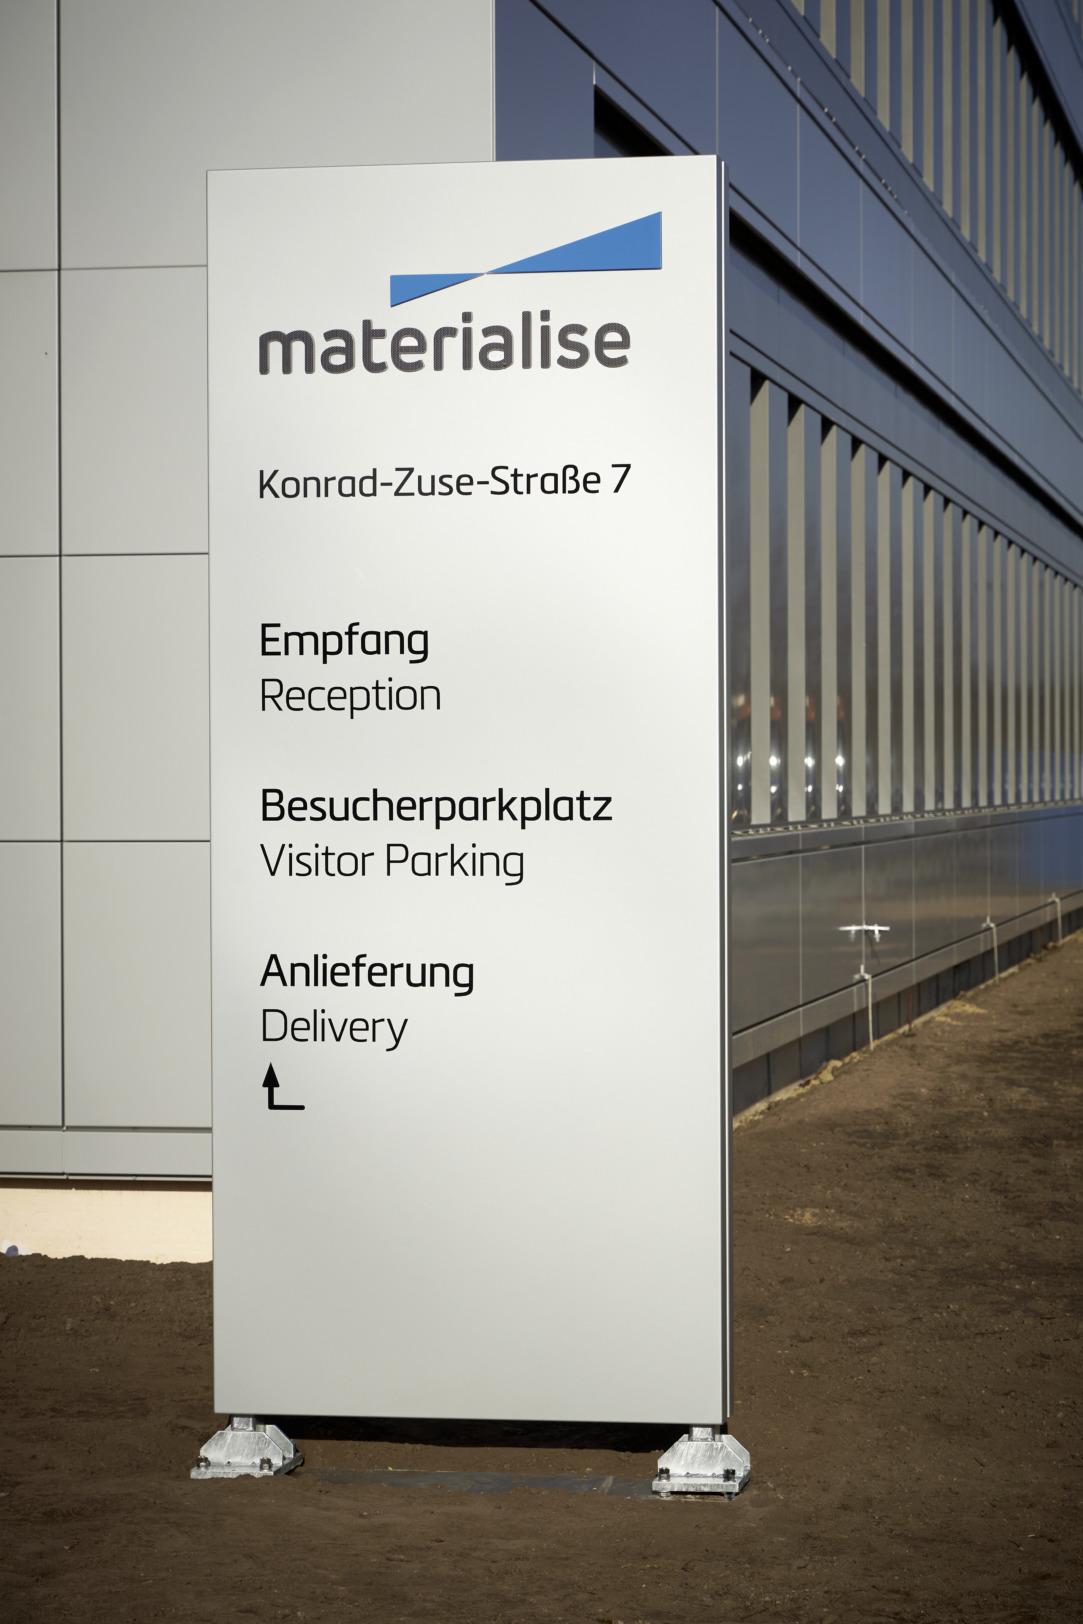 Materialise-stele 2021-03-31 005_3